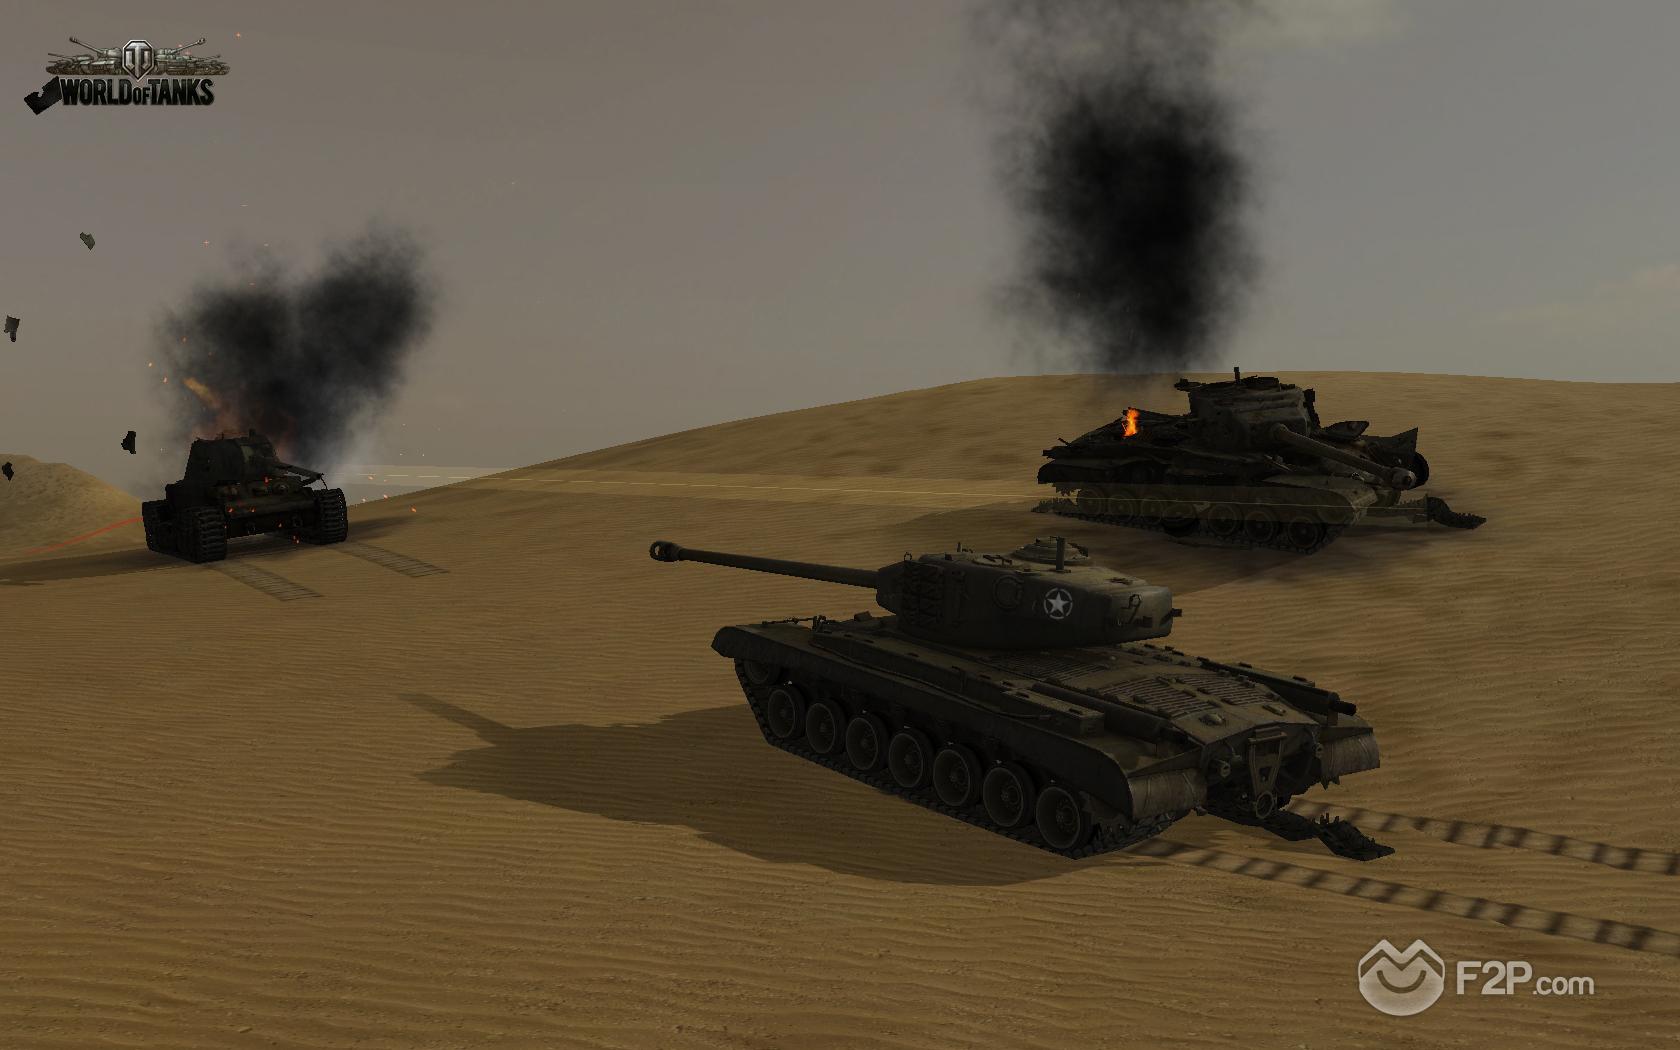 Click image for larger version.Name:World of Tanks 41.jpgViews:196Size:878.0 KBID:3532